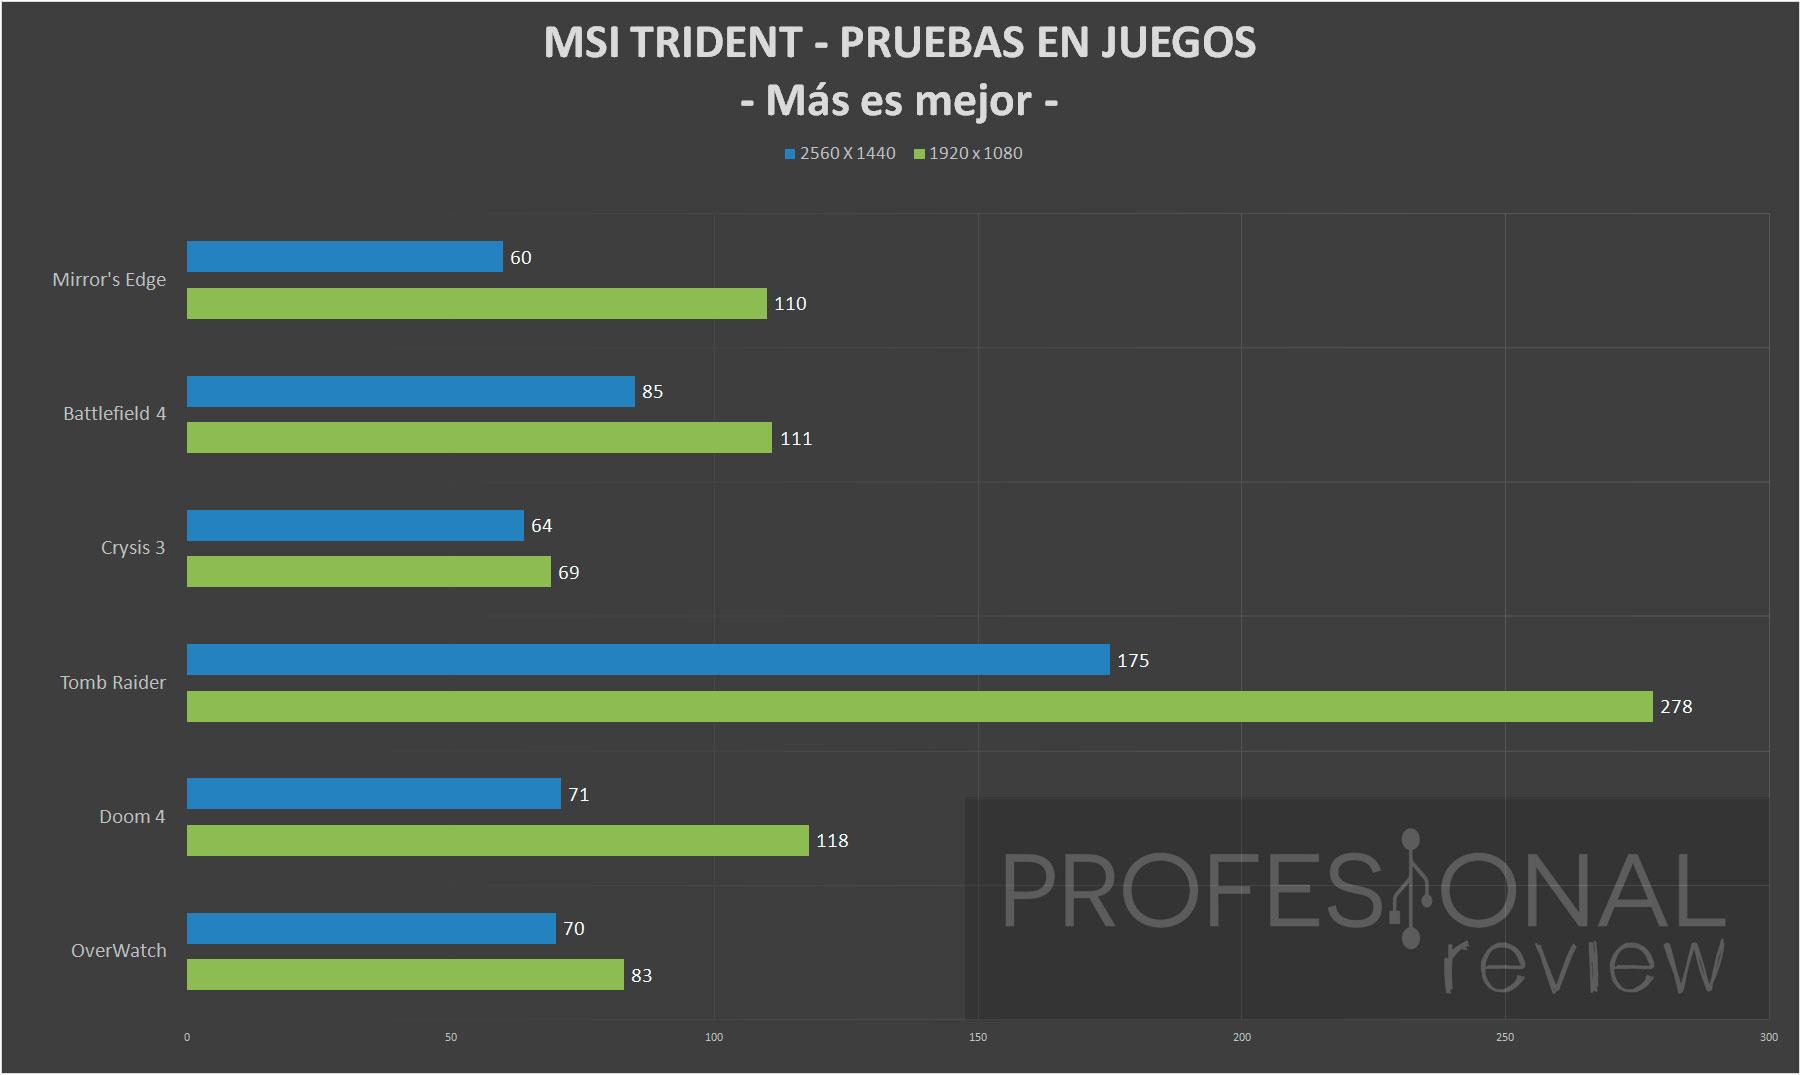 MSI Trident juegos